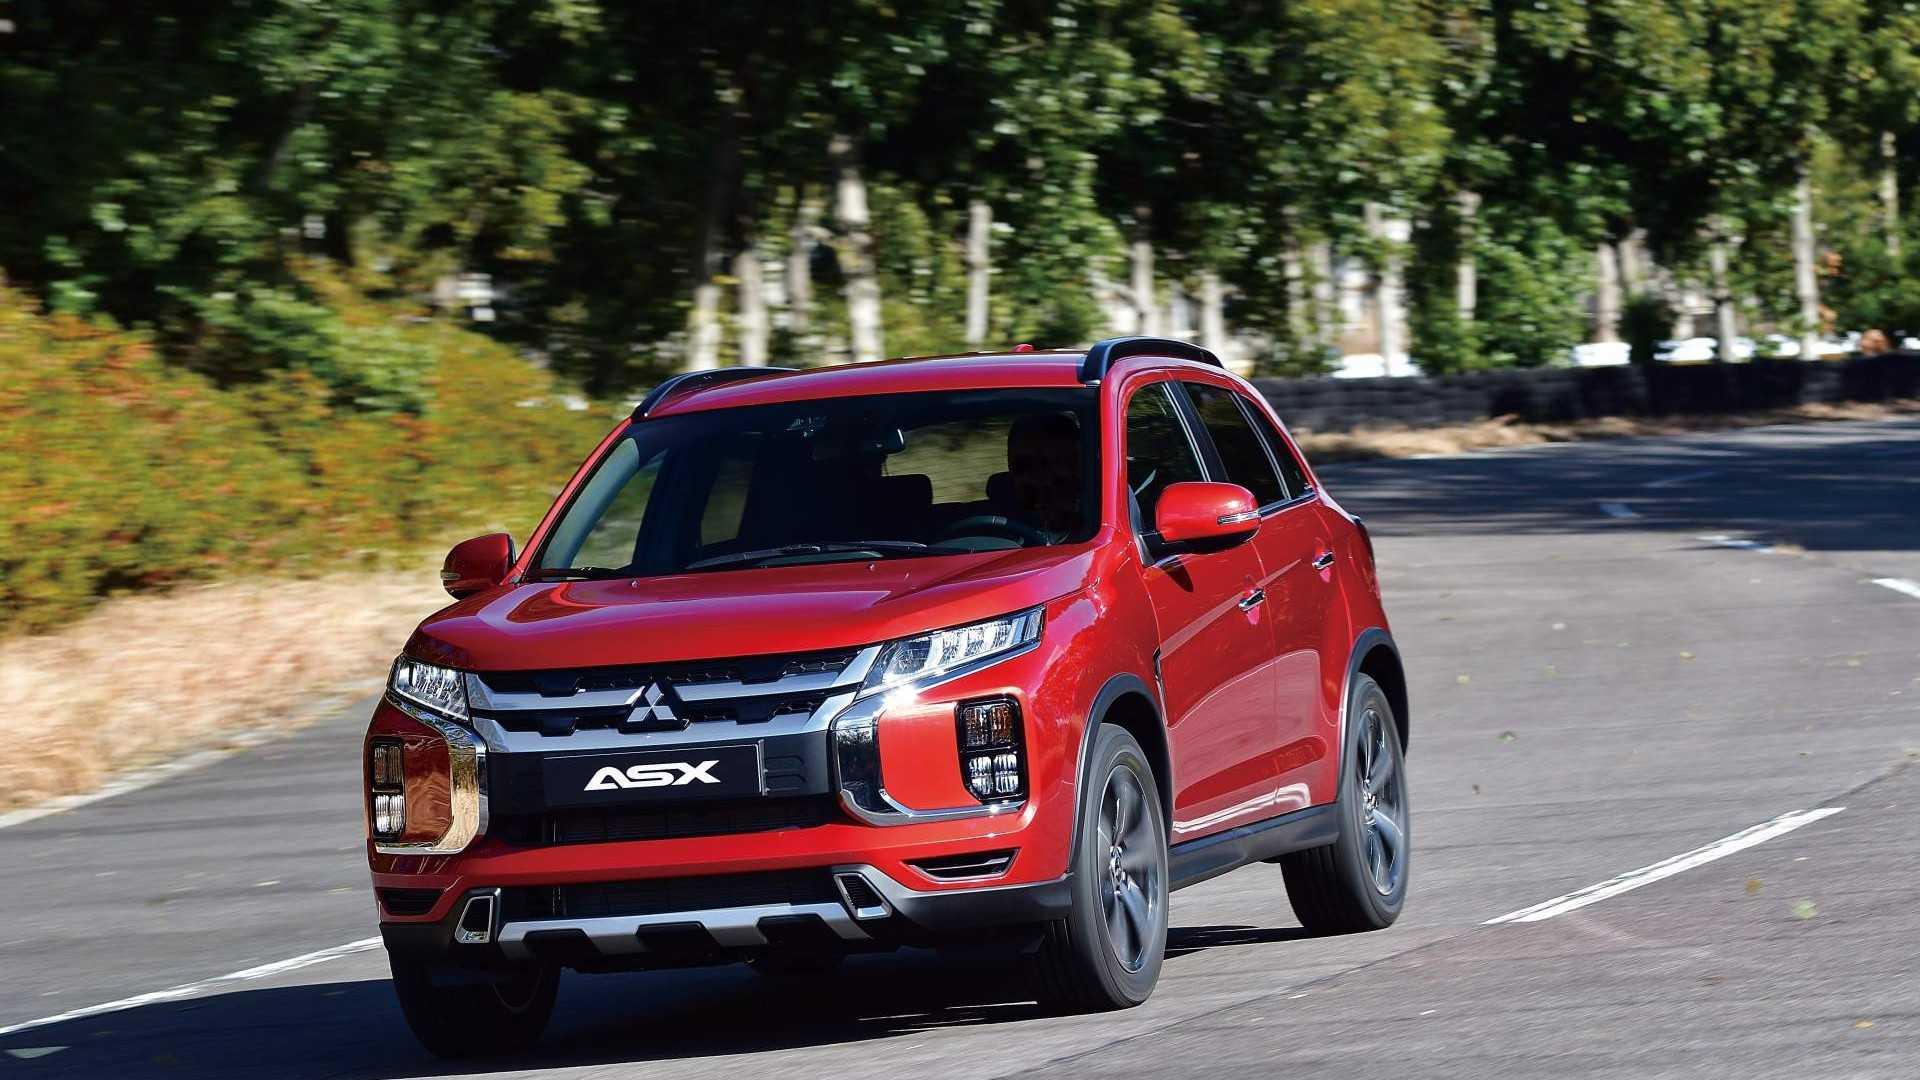 12 All New Mitsubishi Asx 2020 Dimensions Specs and Review for Mitsubishi Asx 2020 Dimensions